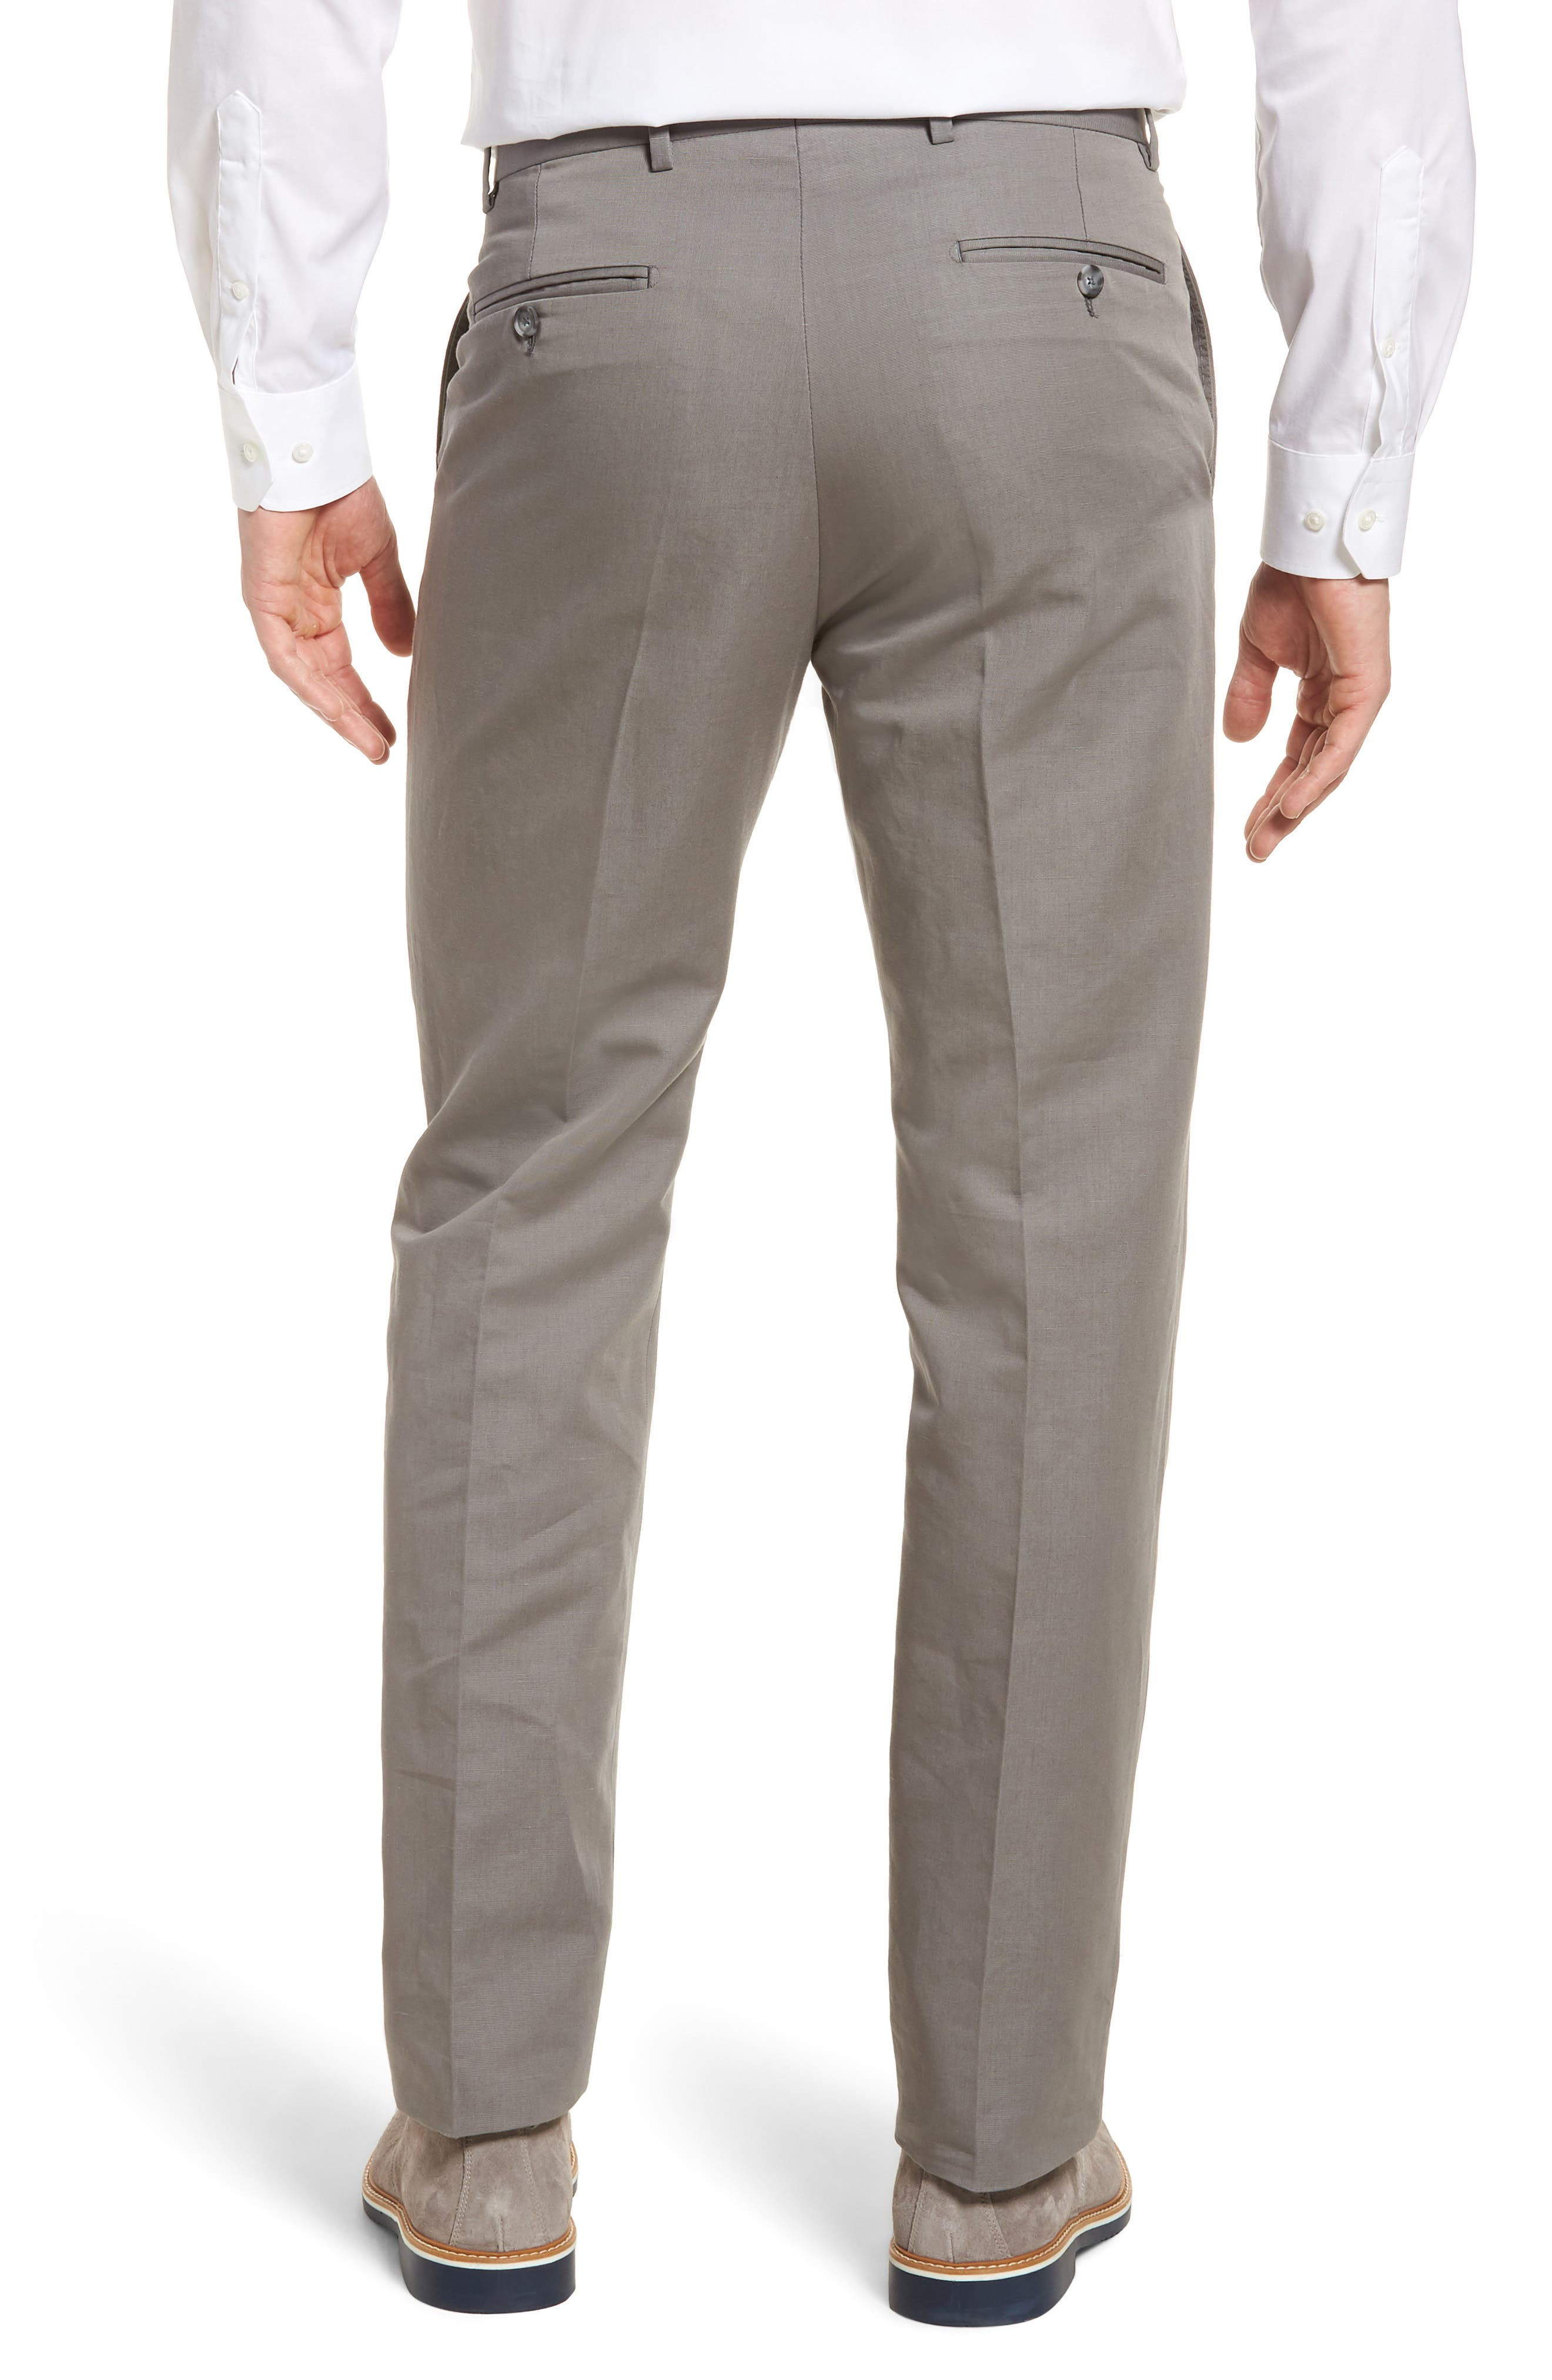 Flat Front Solid Cotton & Linen Trousers,                             Alternate thumbnail 3, color,                             030